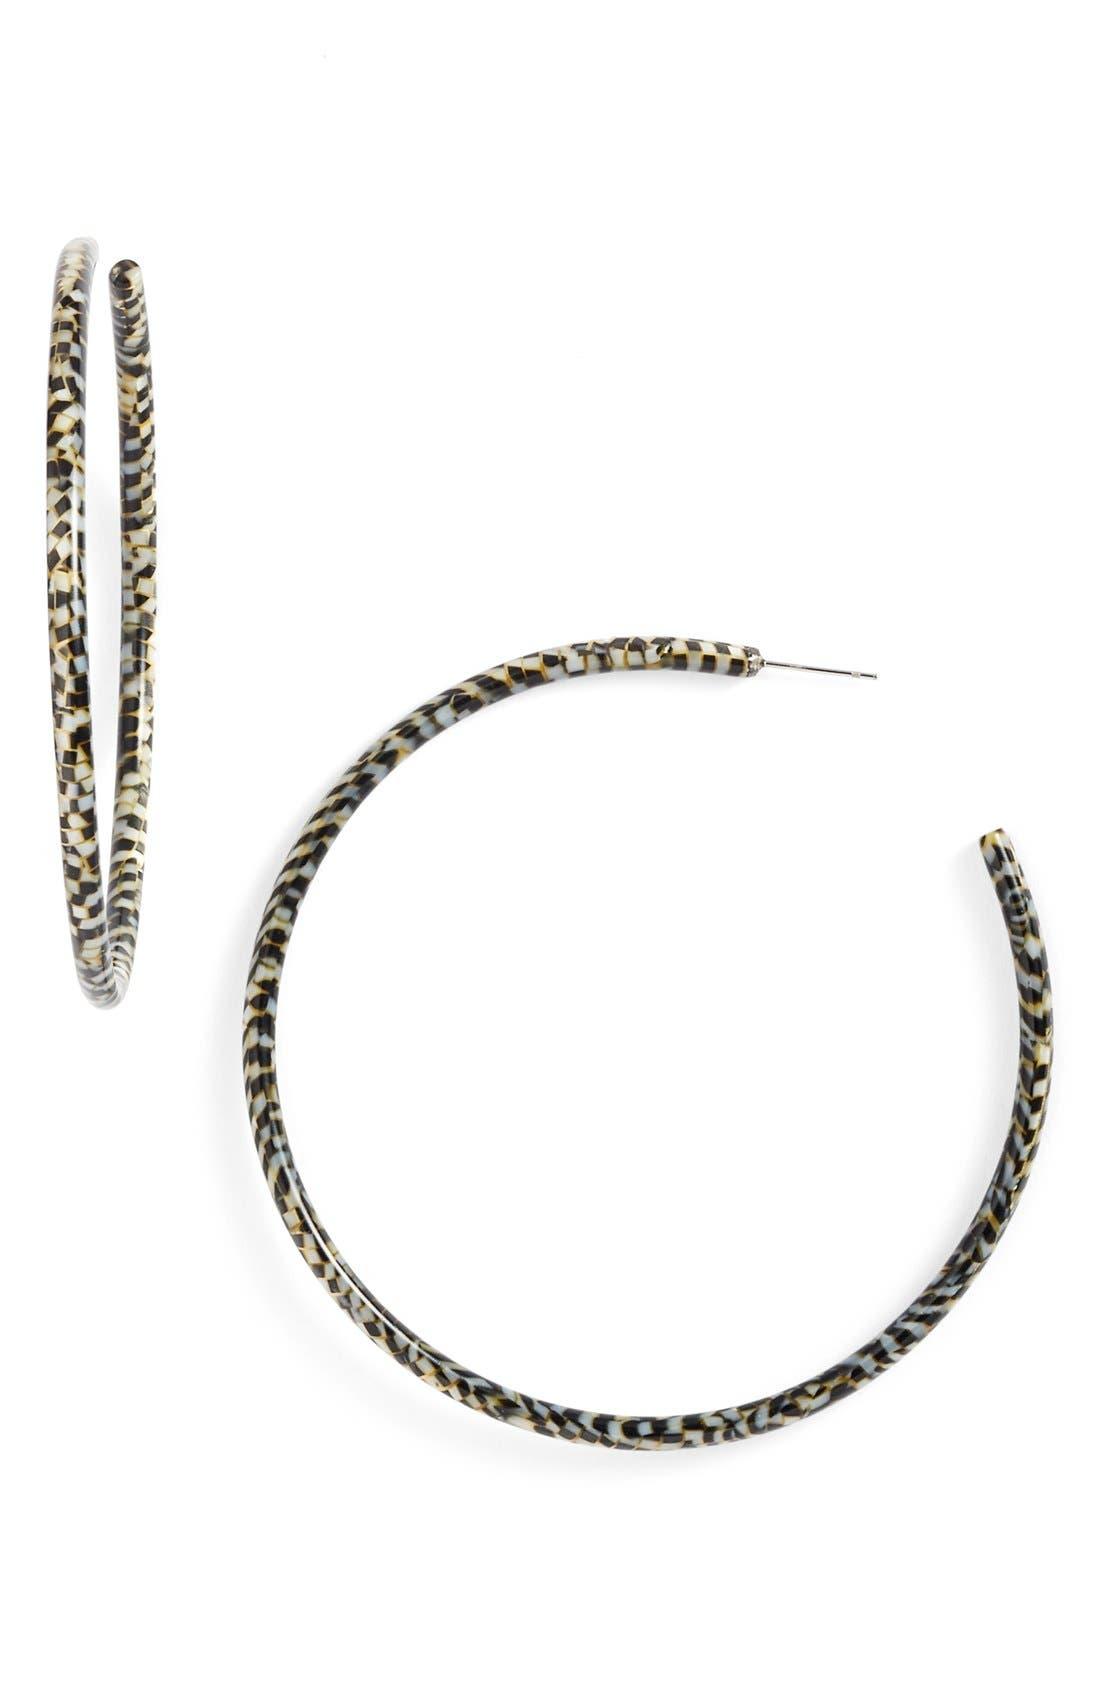 L Erickson 'Jumbo' Hoop Earrings